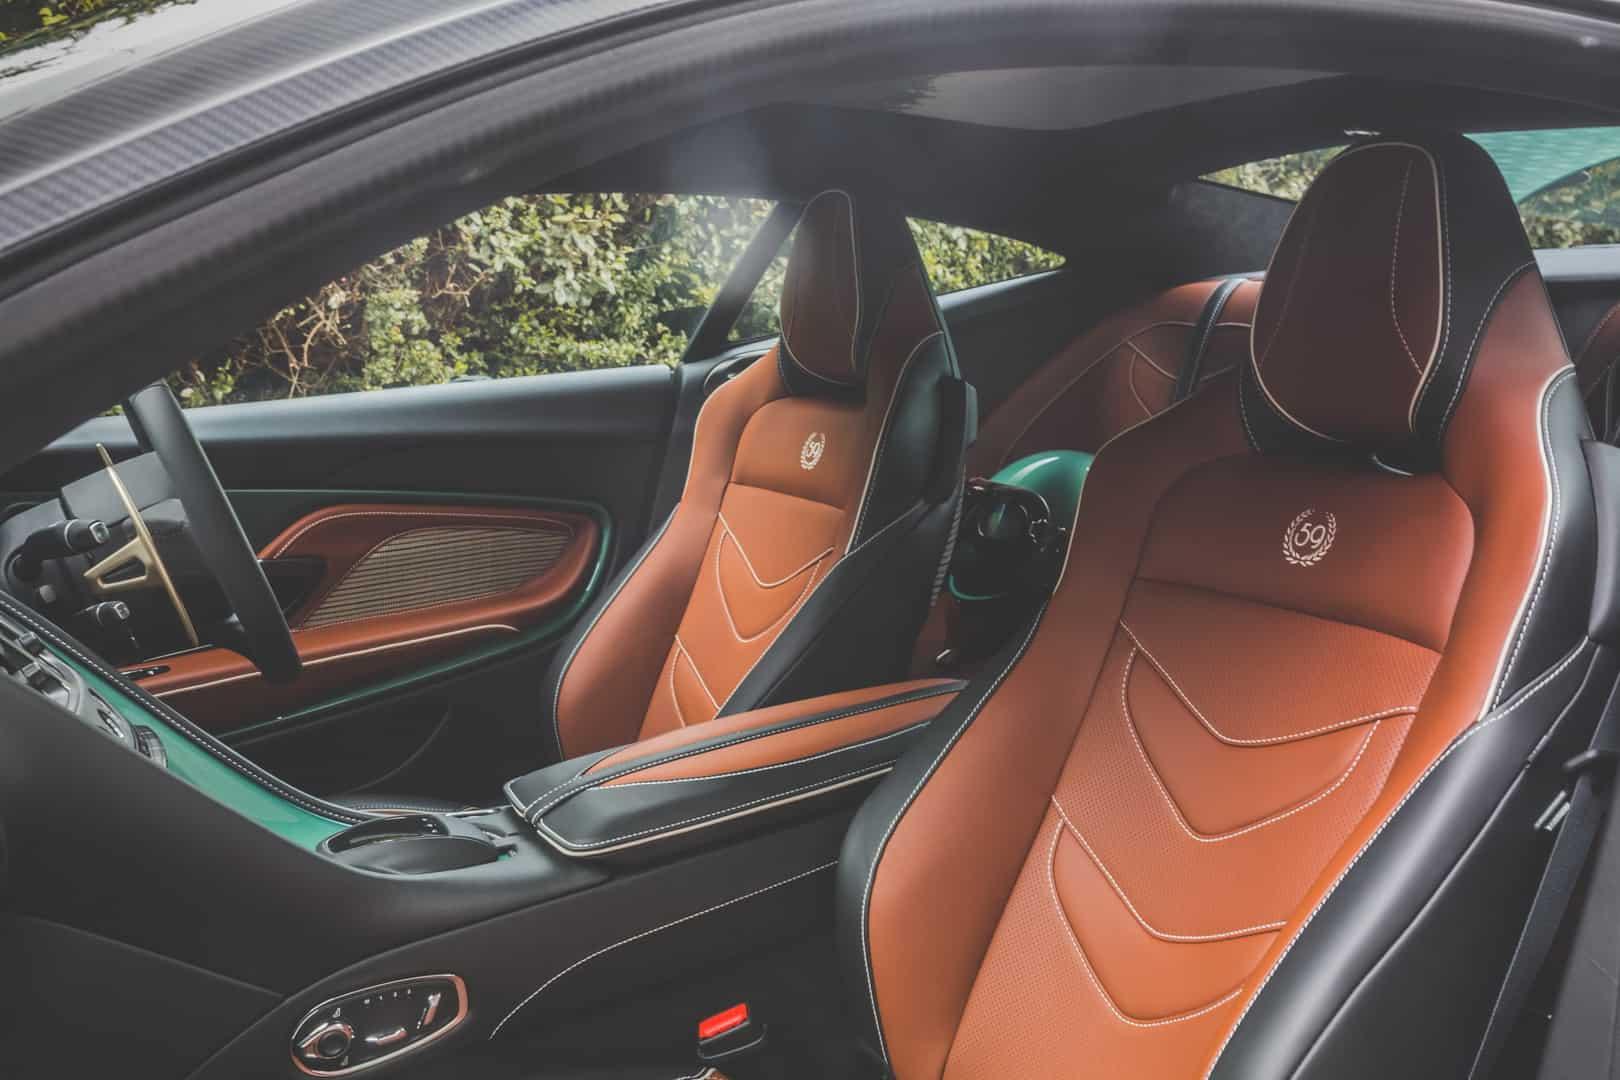 Aston Martin DBS 59 13